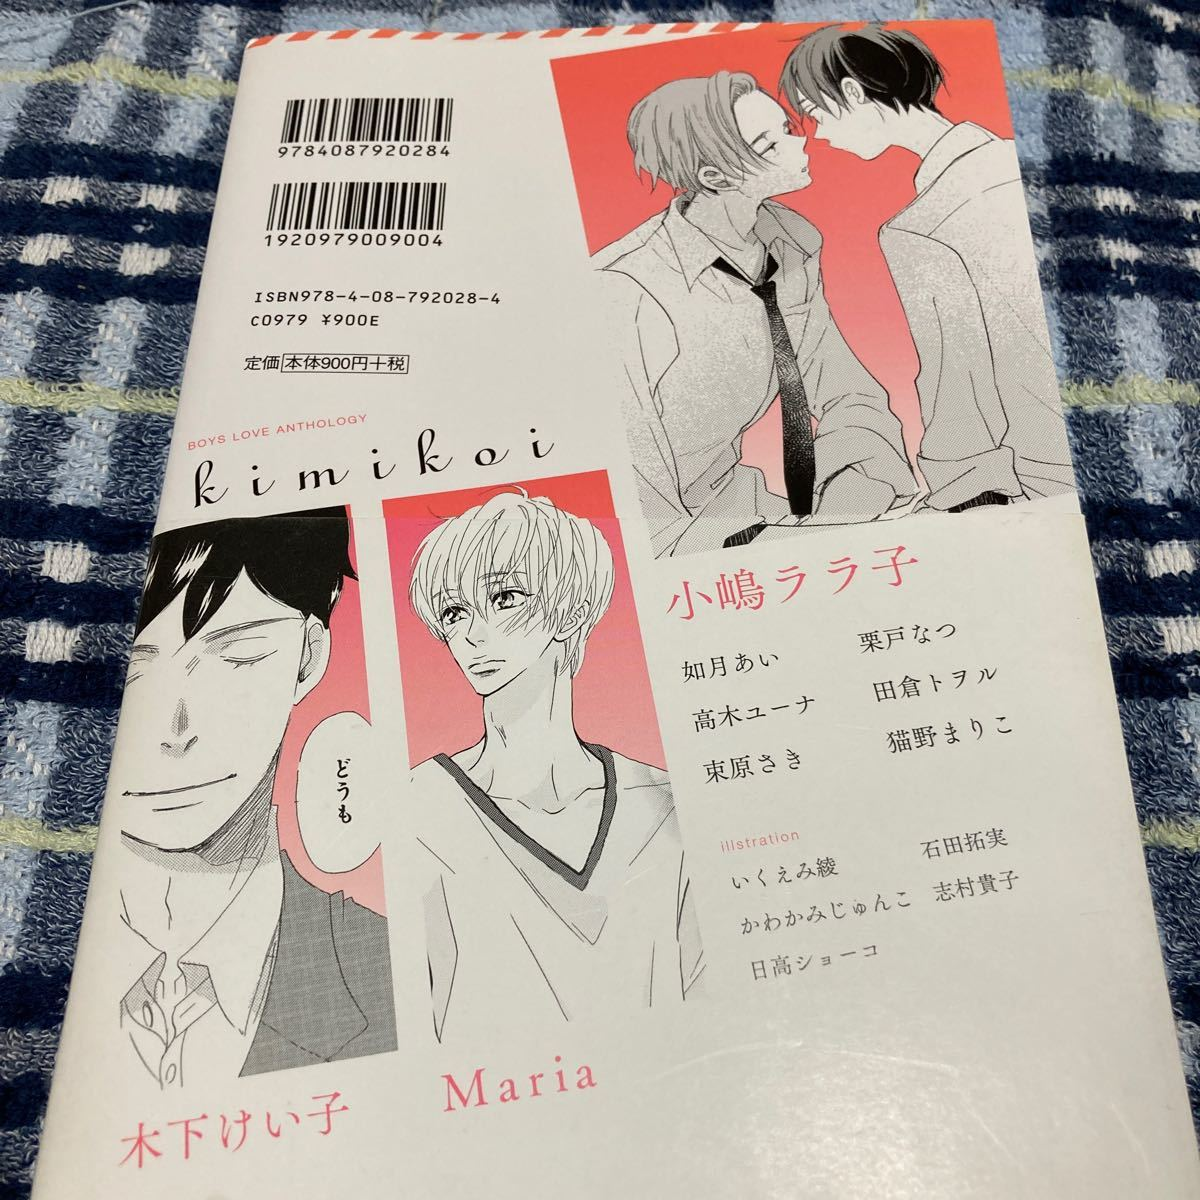 BL 漫画 コミック 君恋 学生編 1 集英社